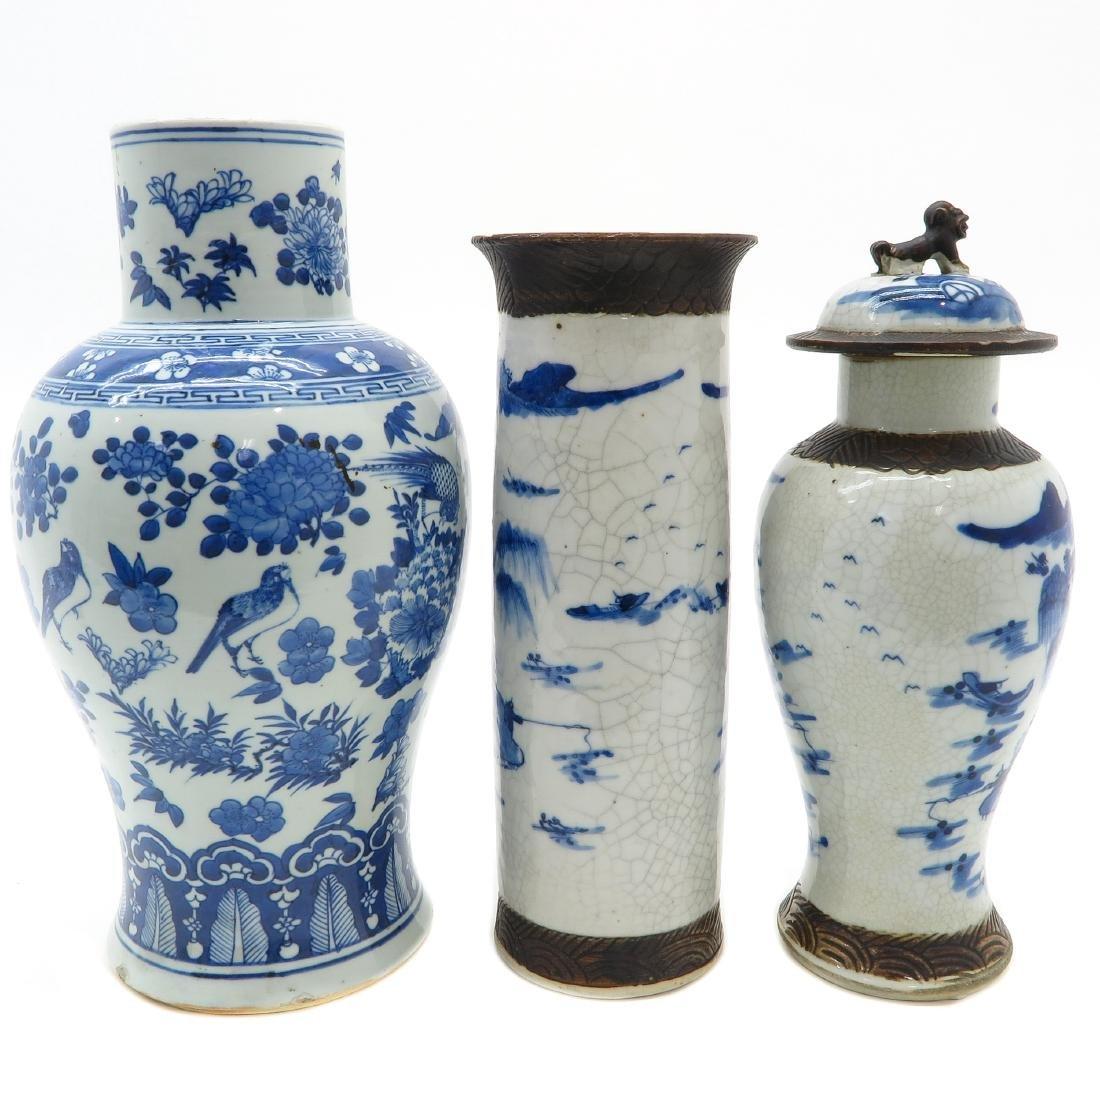 Lot of 3 Vases - 2